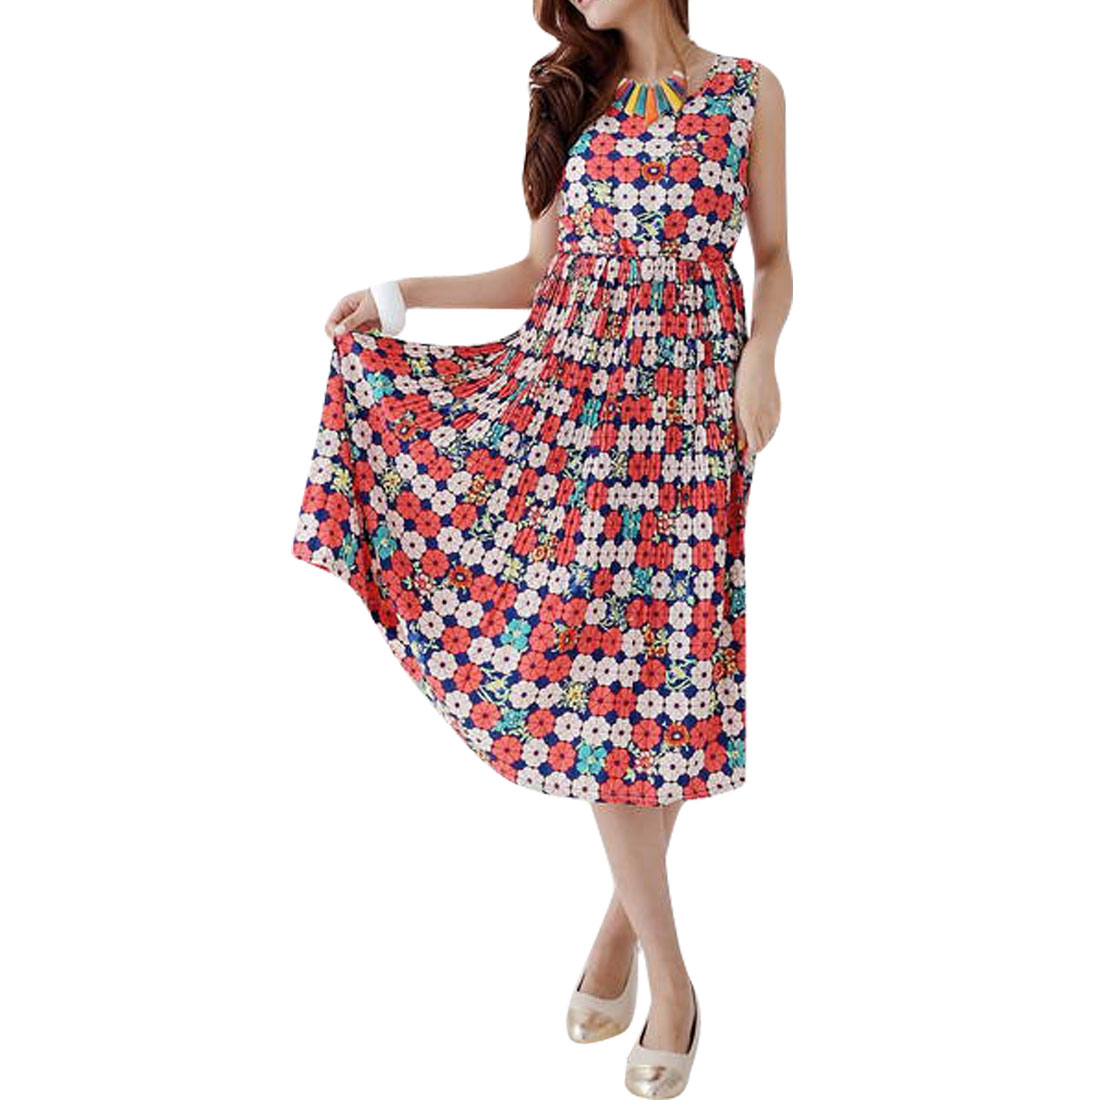 Ladies Sleeveless Elastic Waist Dress Dark Blue Red S